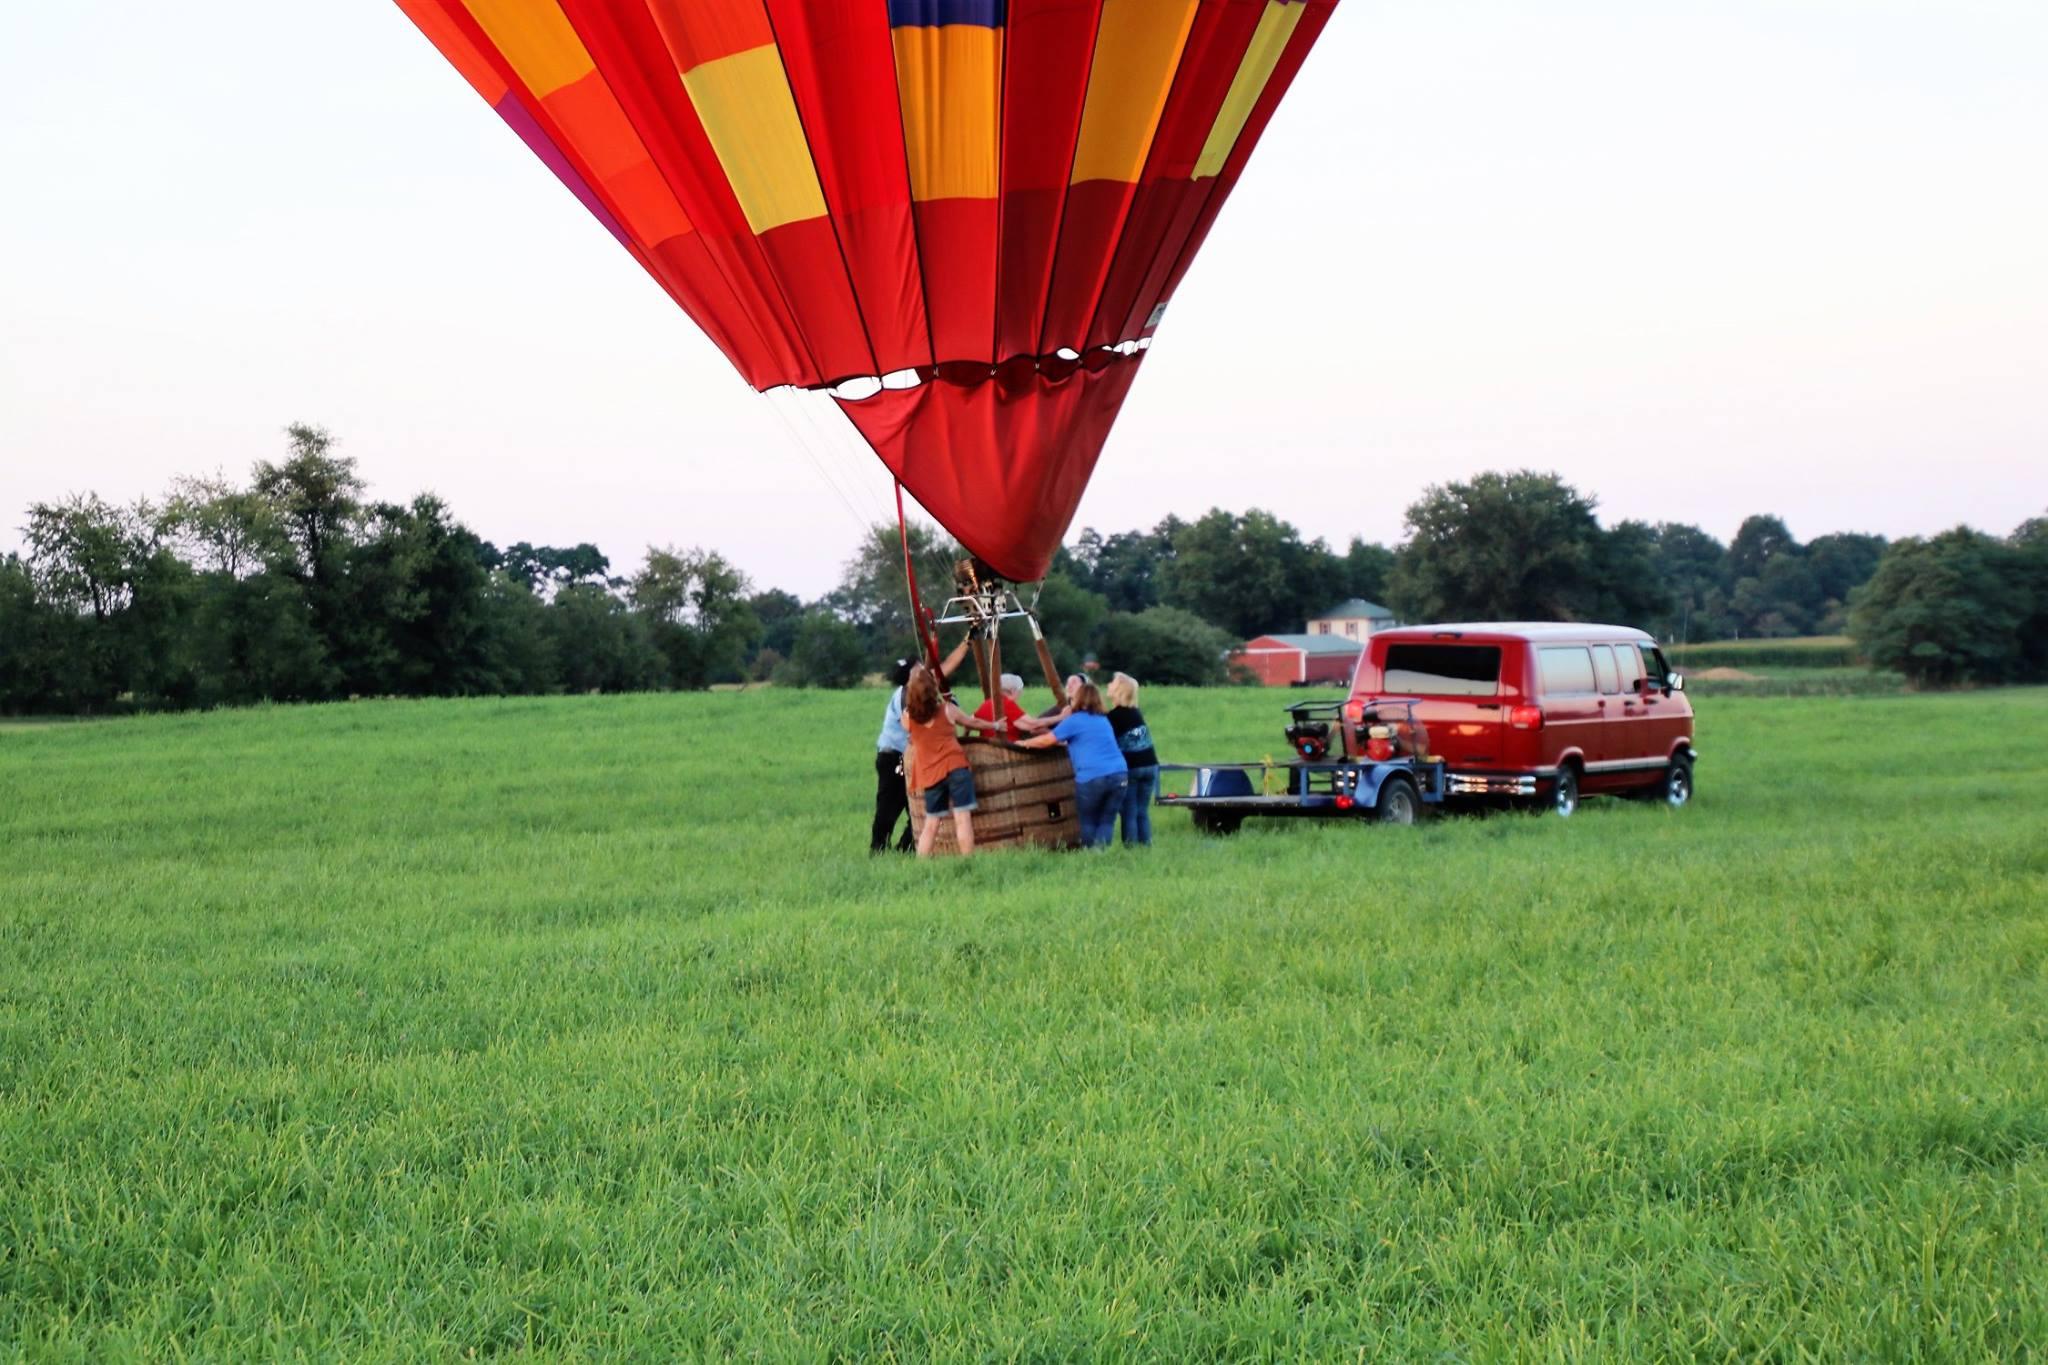 Make a wish hot air balloon ride with Sister Pat Wilson